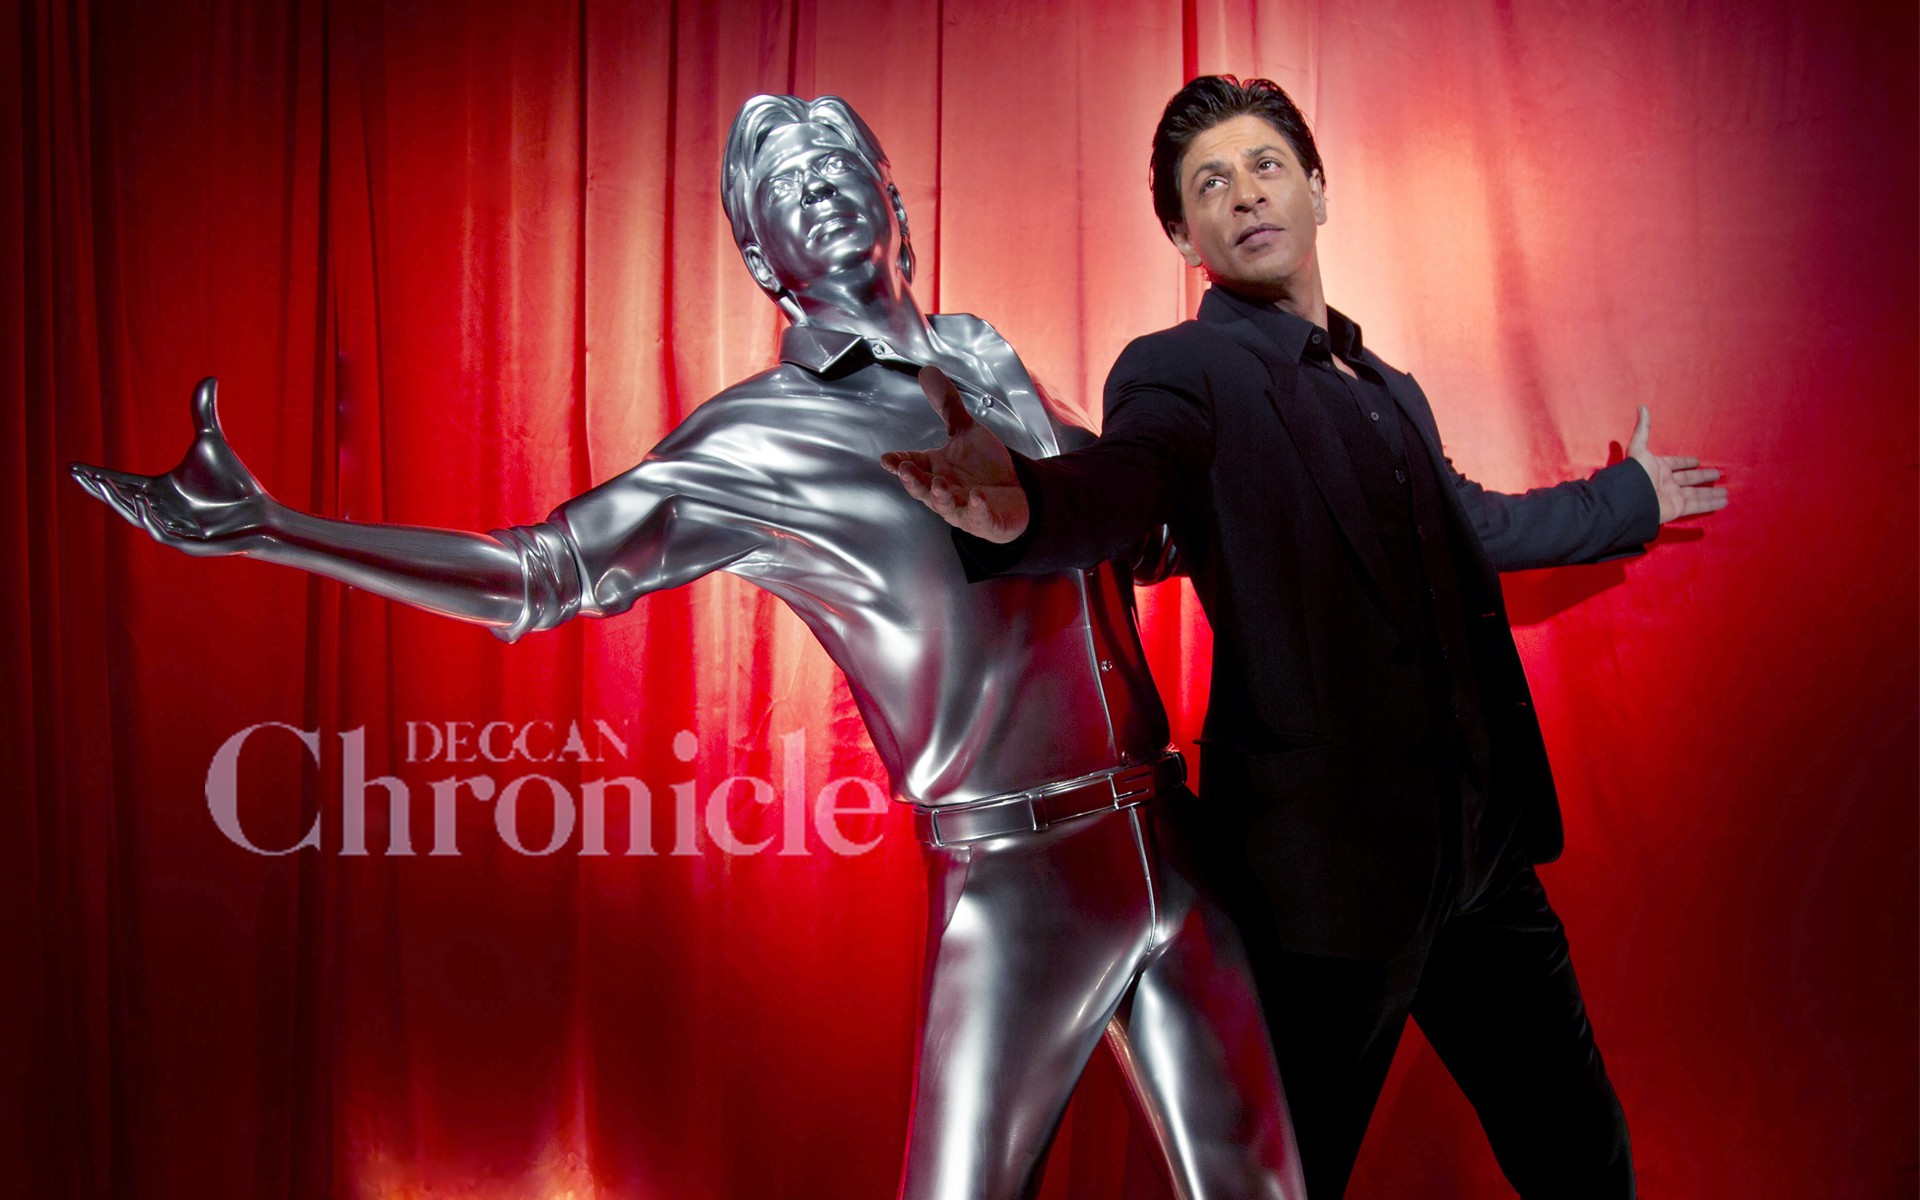 Download Shahrukh Khan Full Hd Wallpaper Gallery: 50+ Shahrukh Khan Images, Photos, Pics & HD Wallpapers